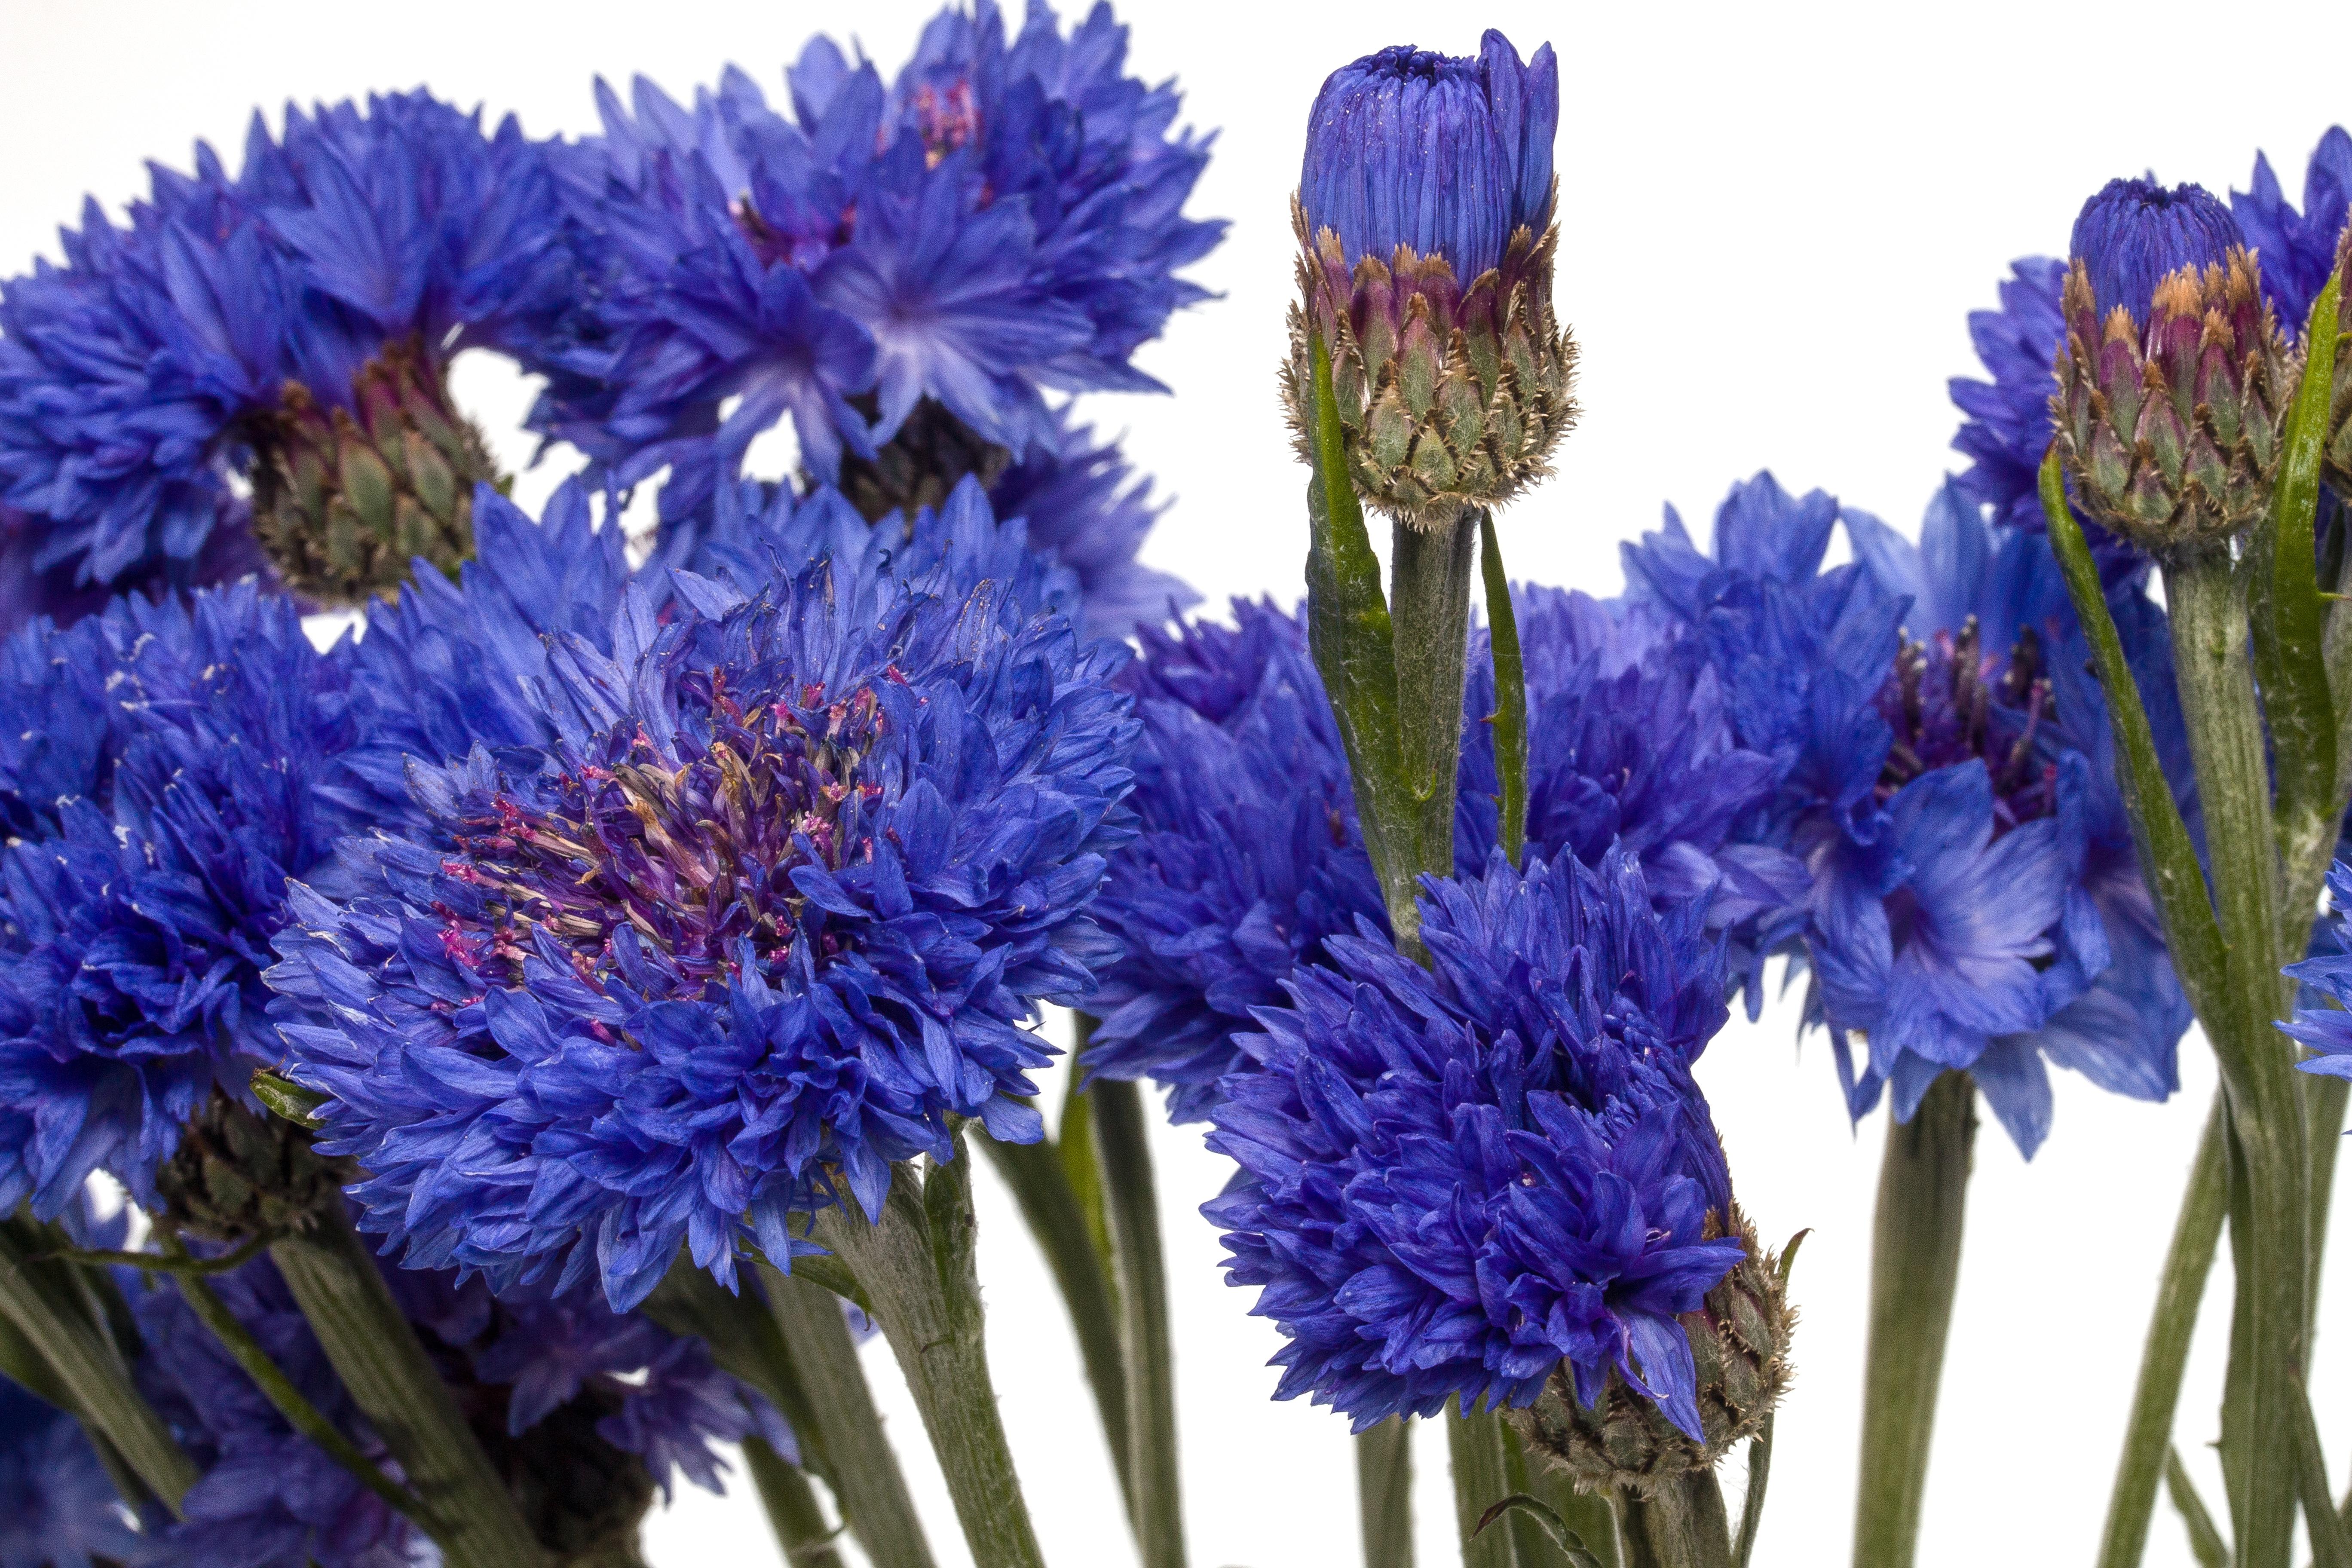 Free Images Blossom Bloom Macro Blue Flower Cornflower